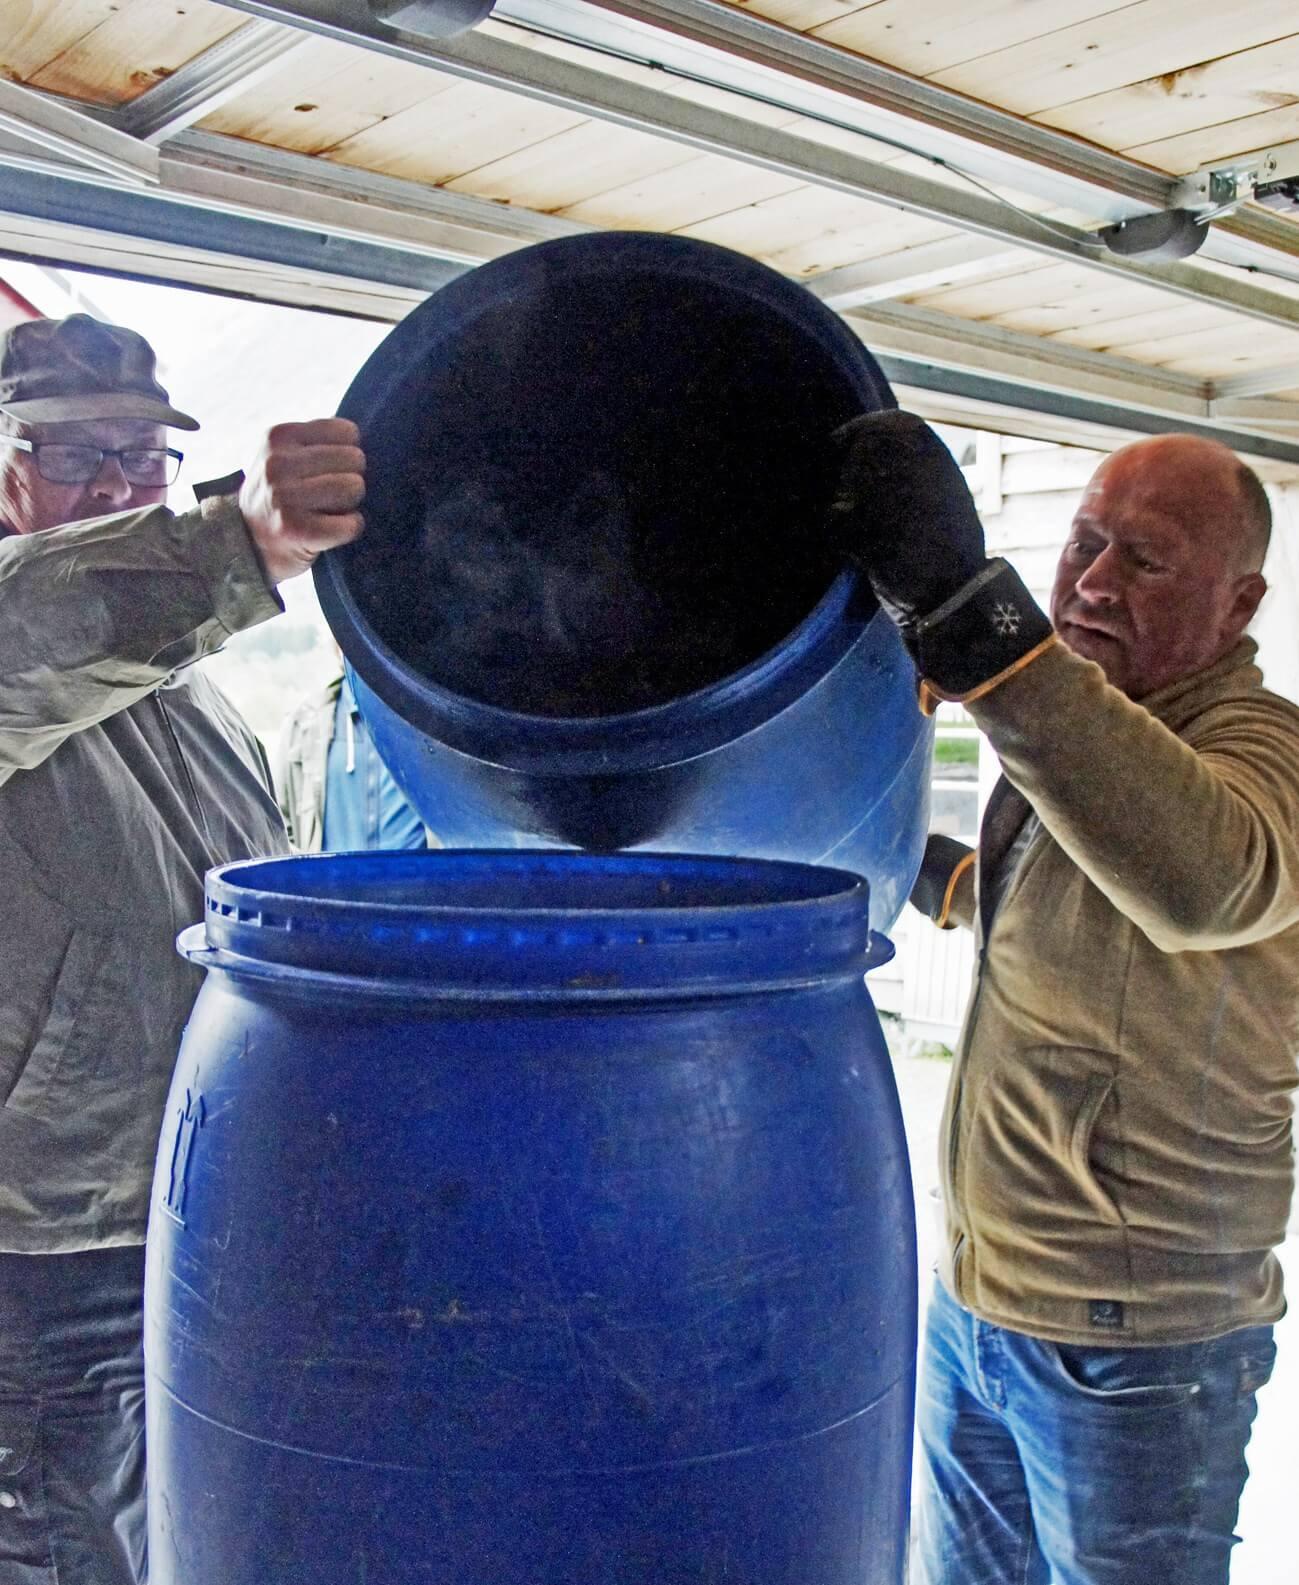 Переливание сусла в фильтр-чан из заторного бака